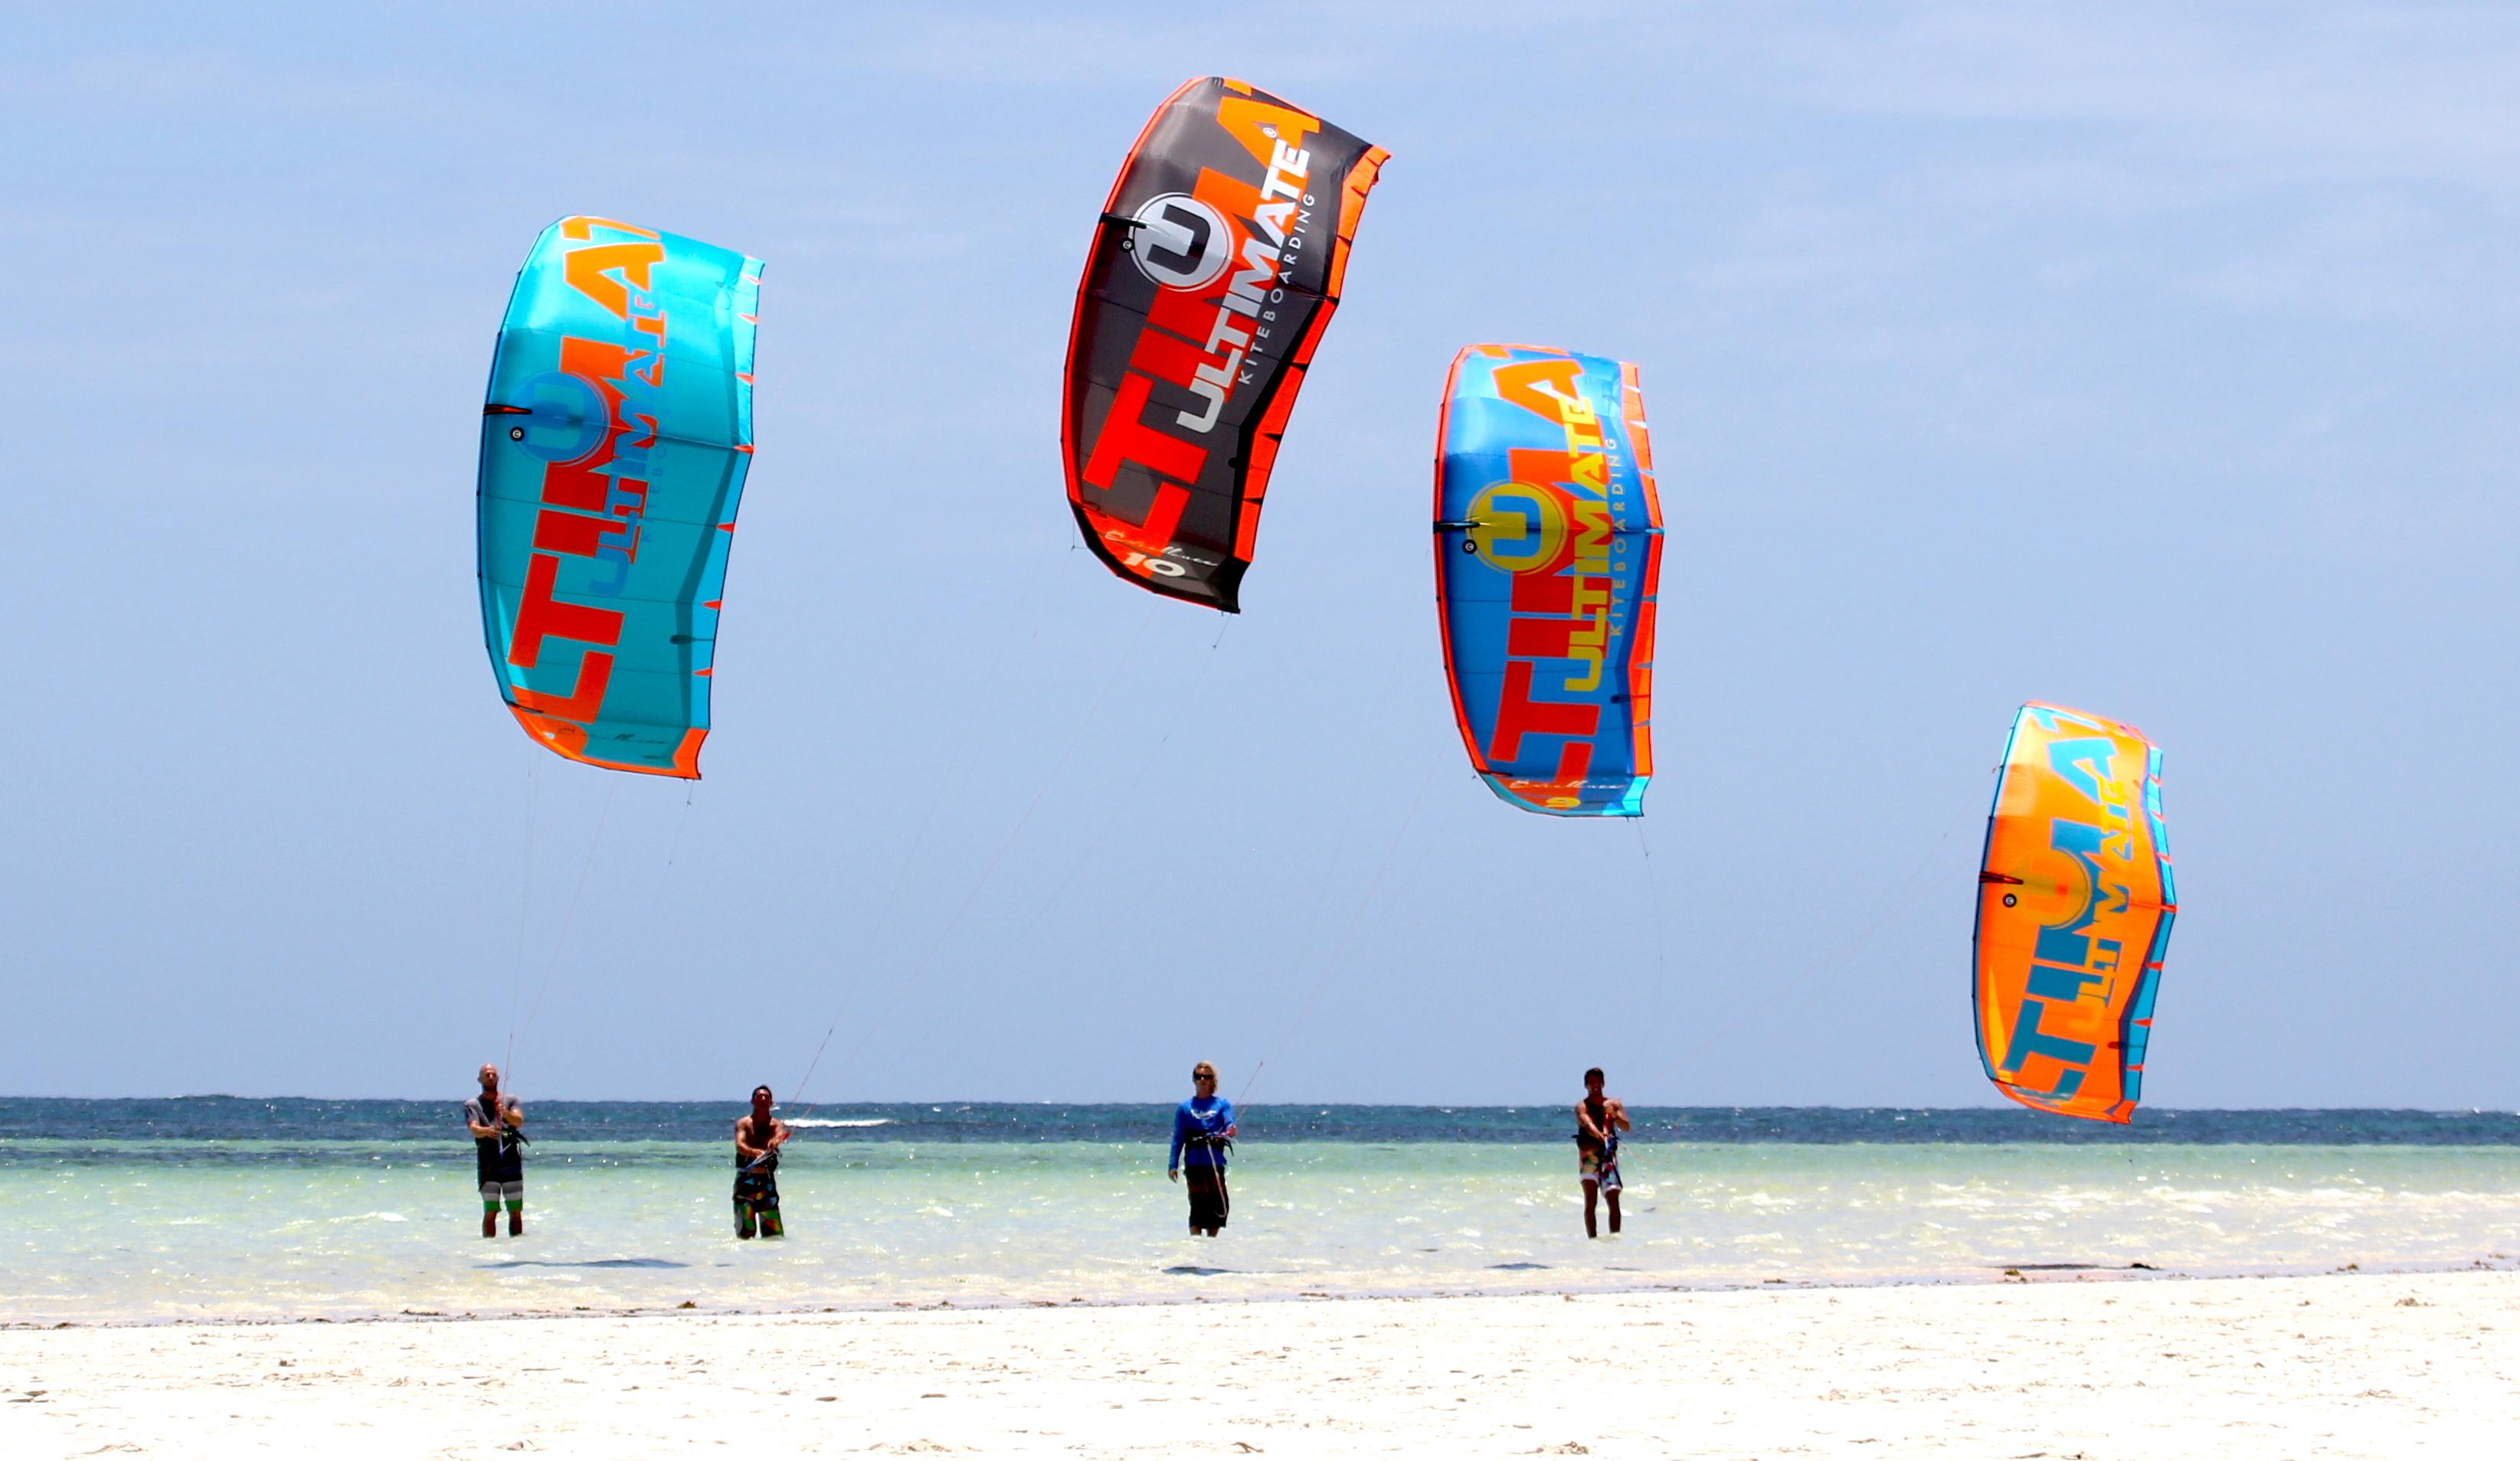 Ripartono i corsi di kitesurf